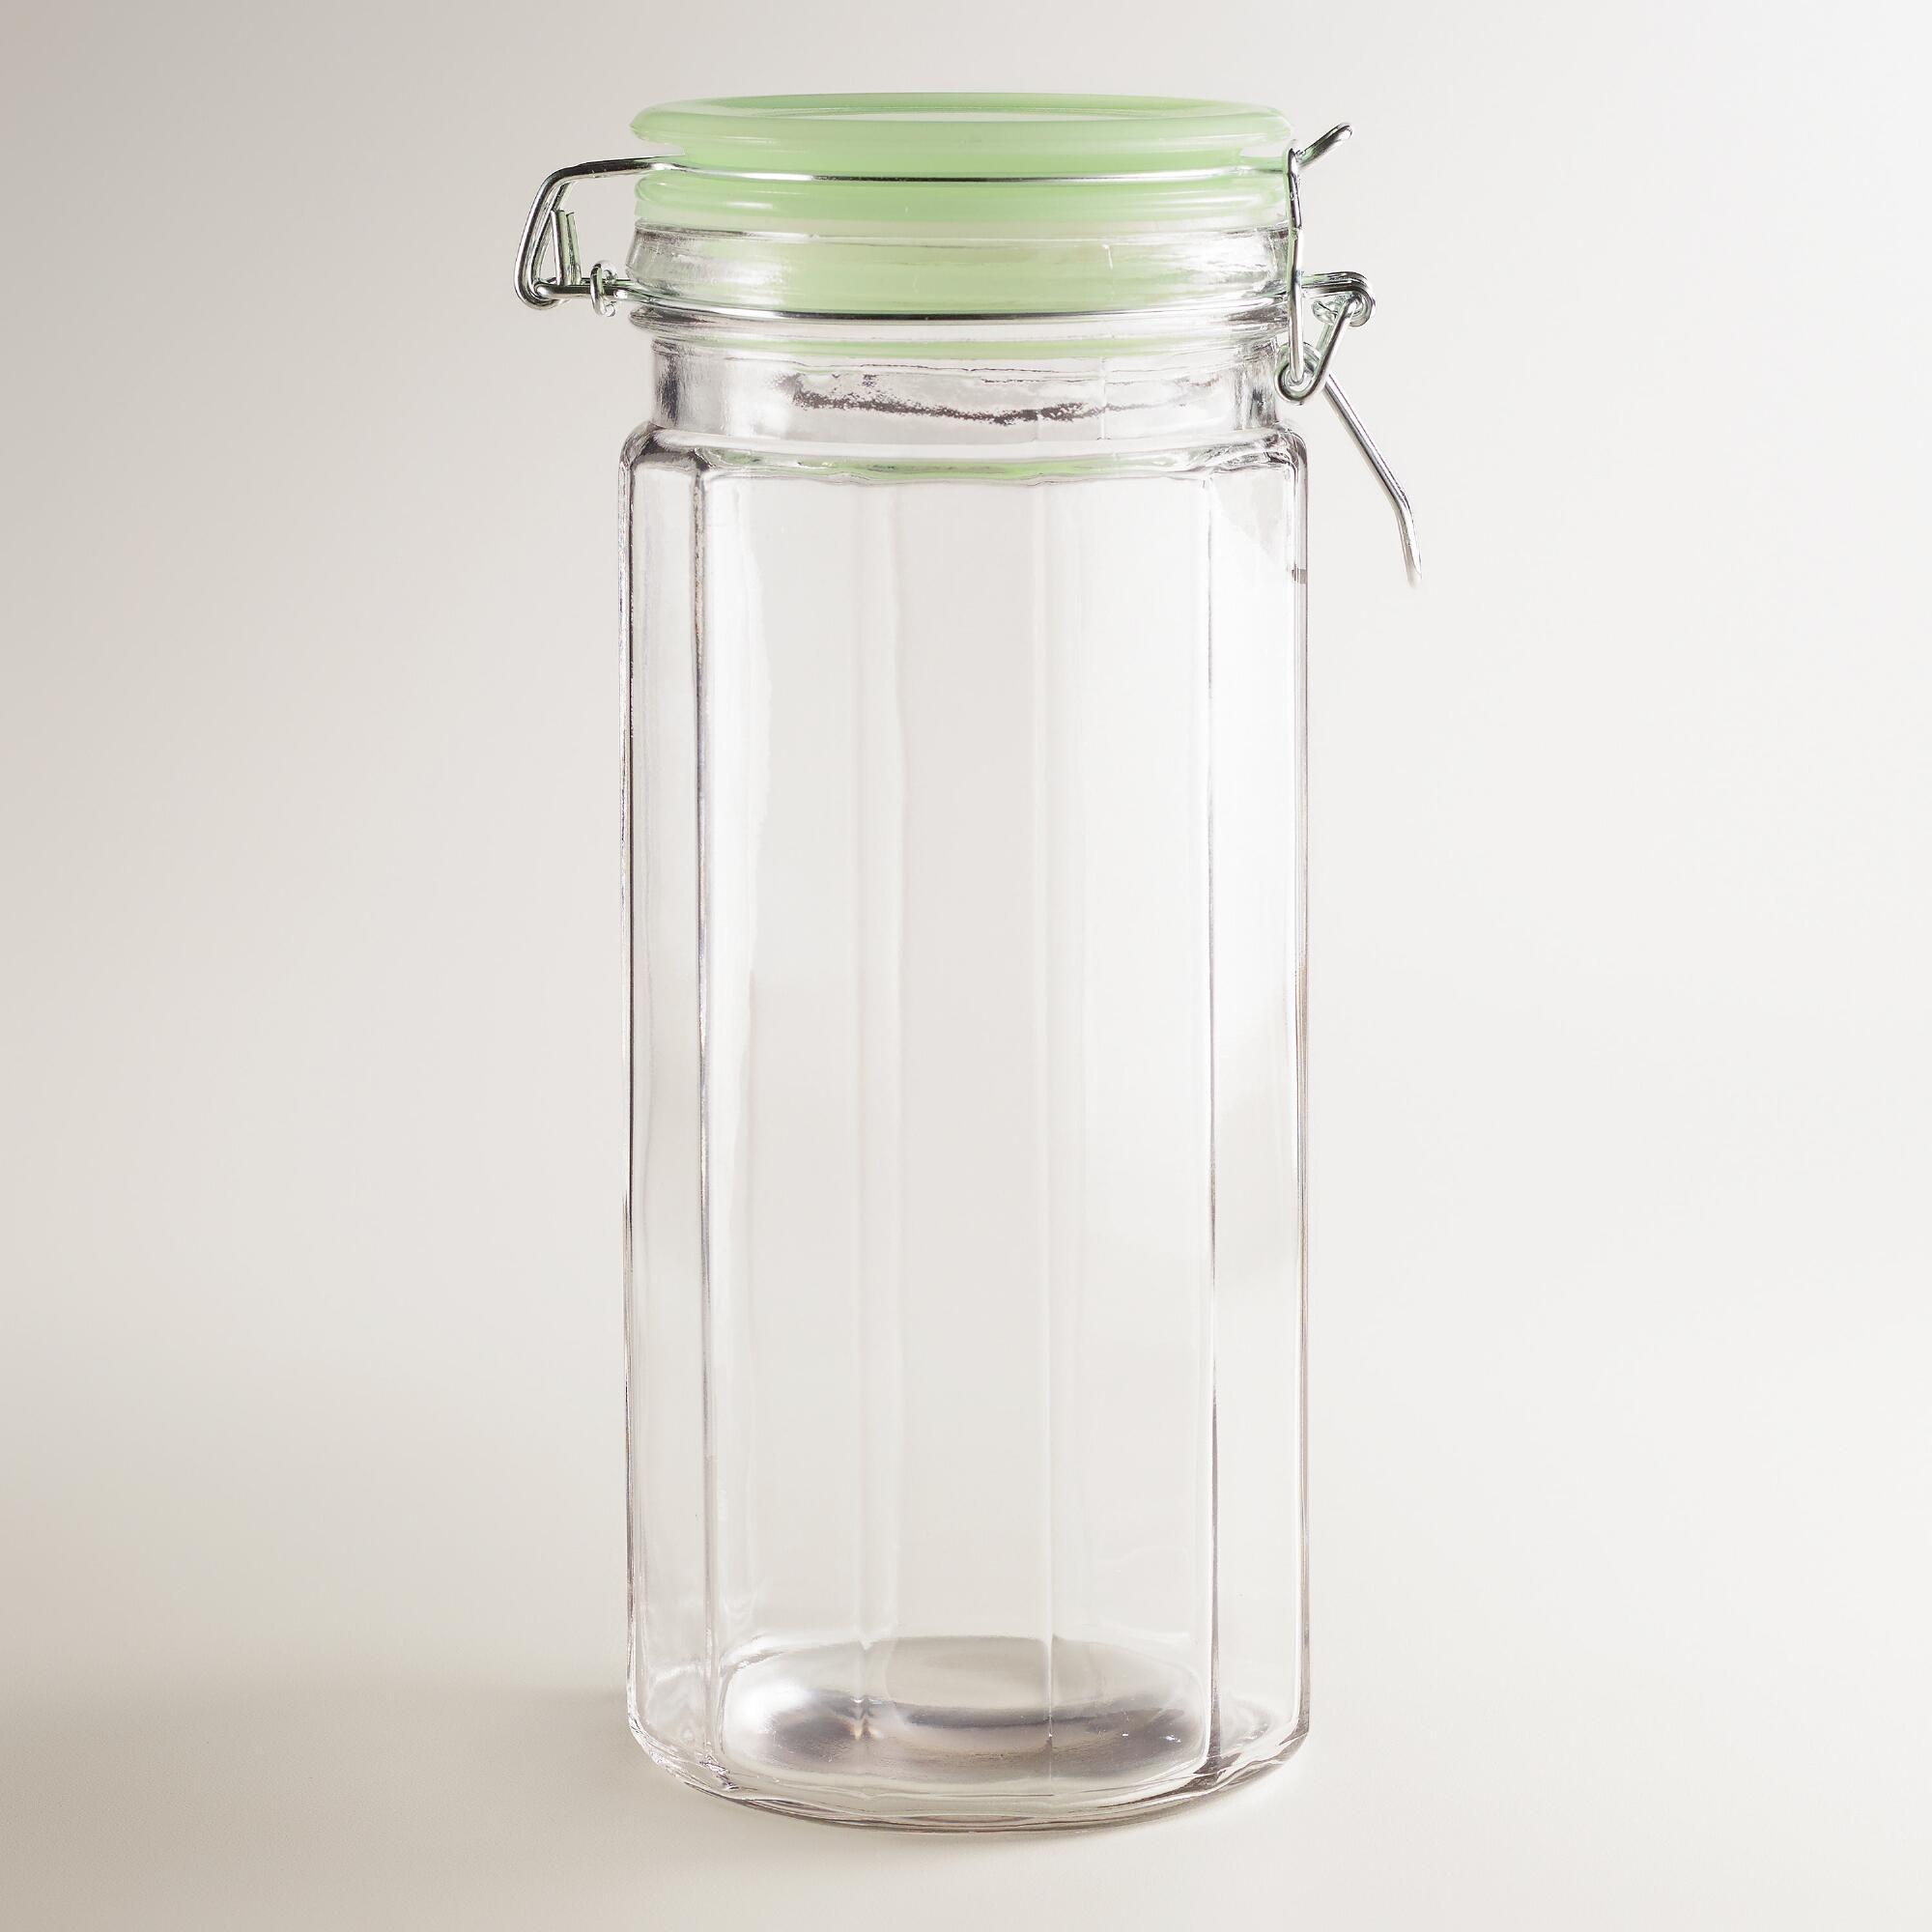 large glass clamp jars with jadeite lids set of 4